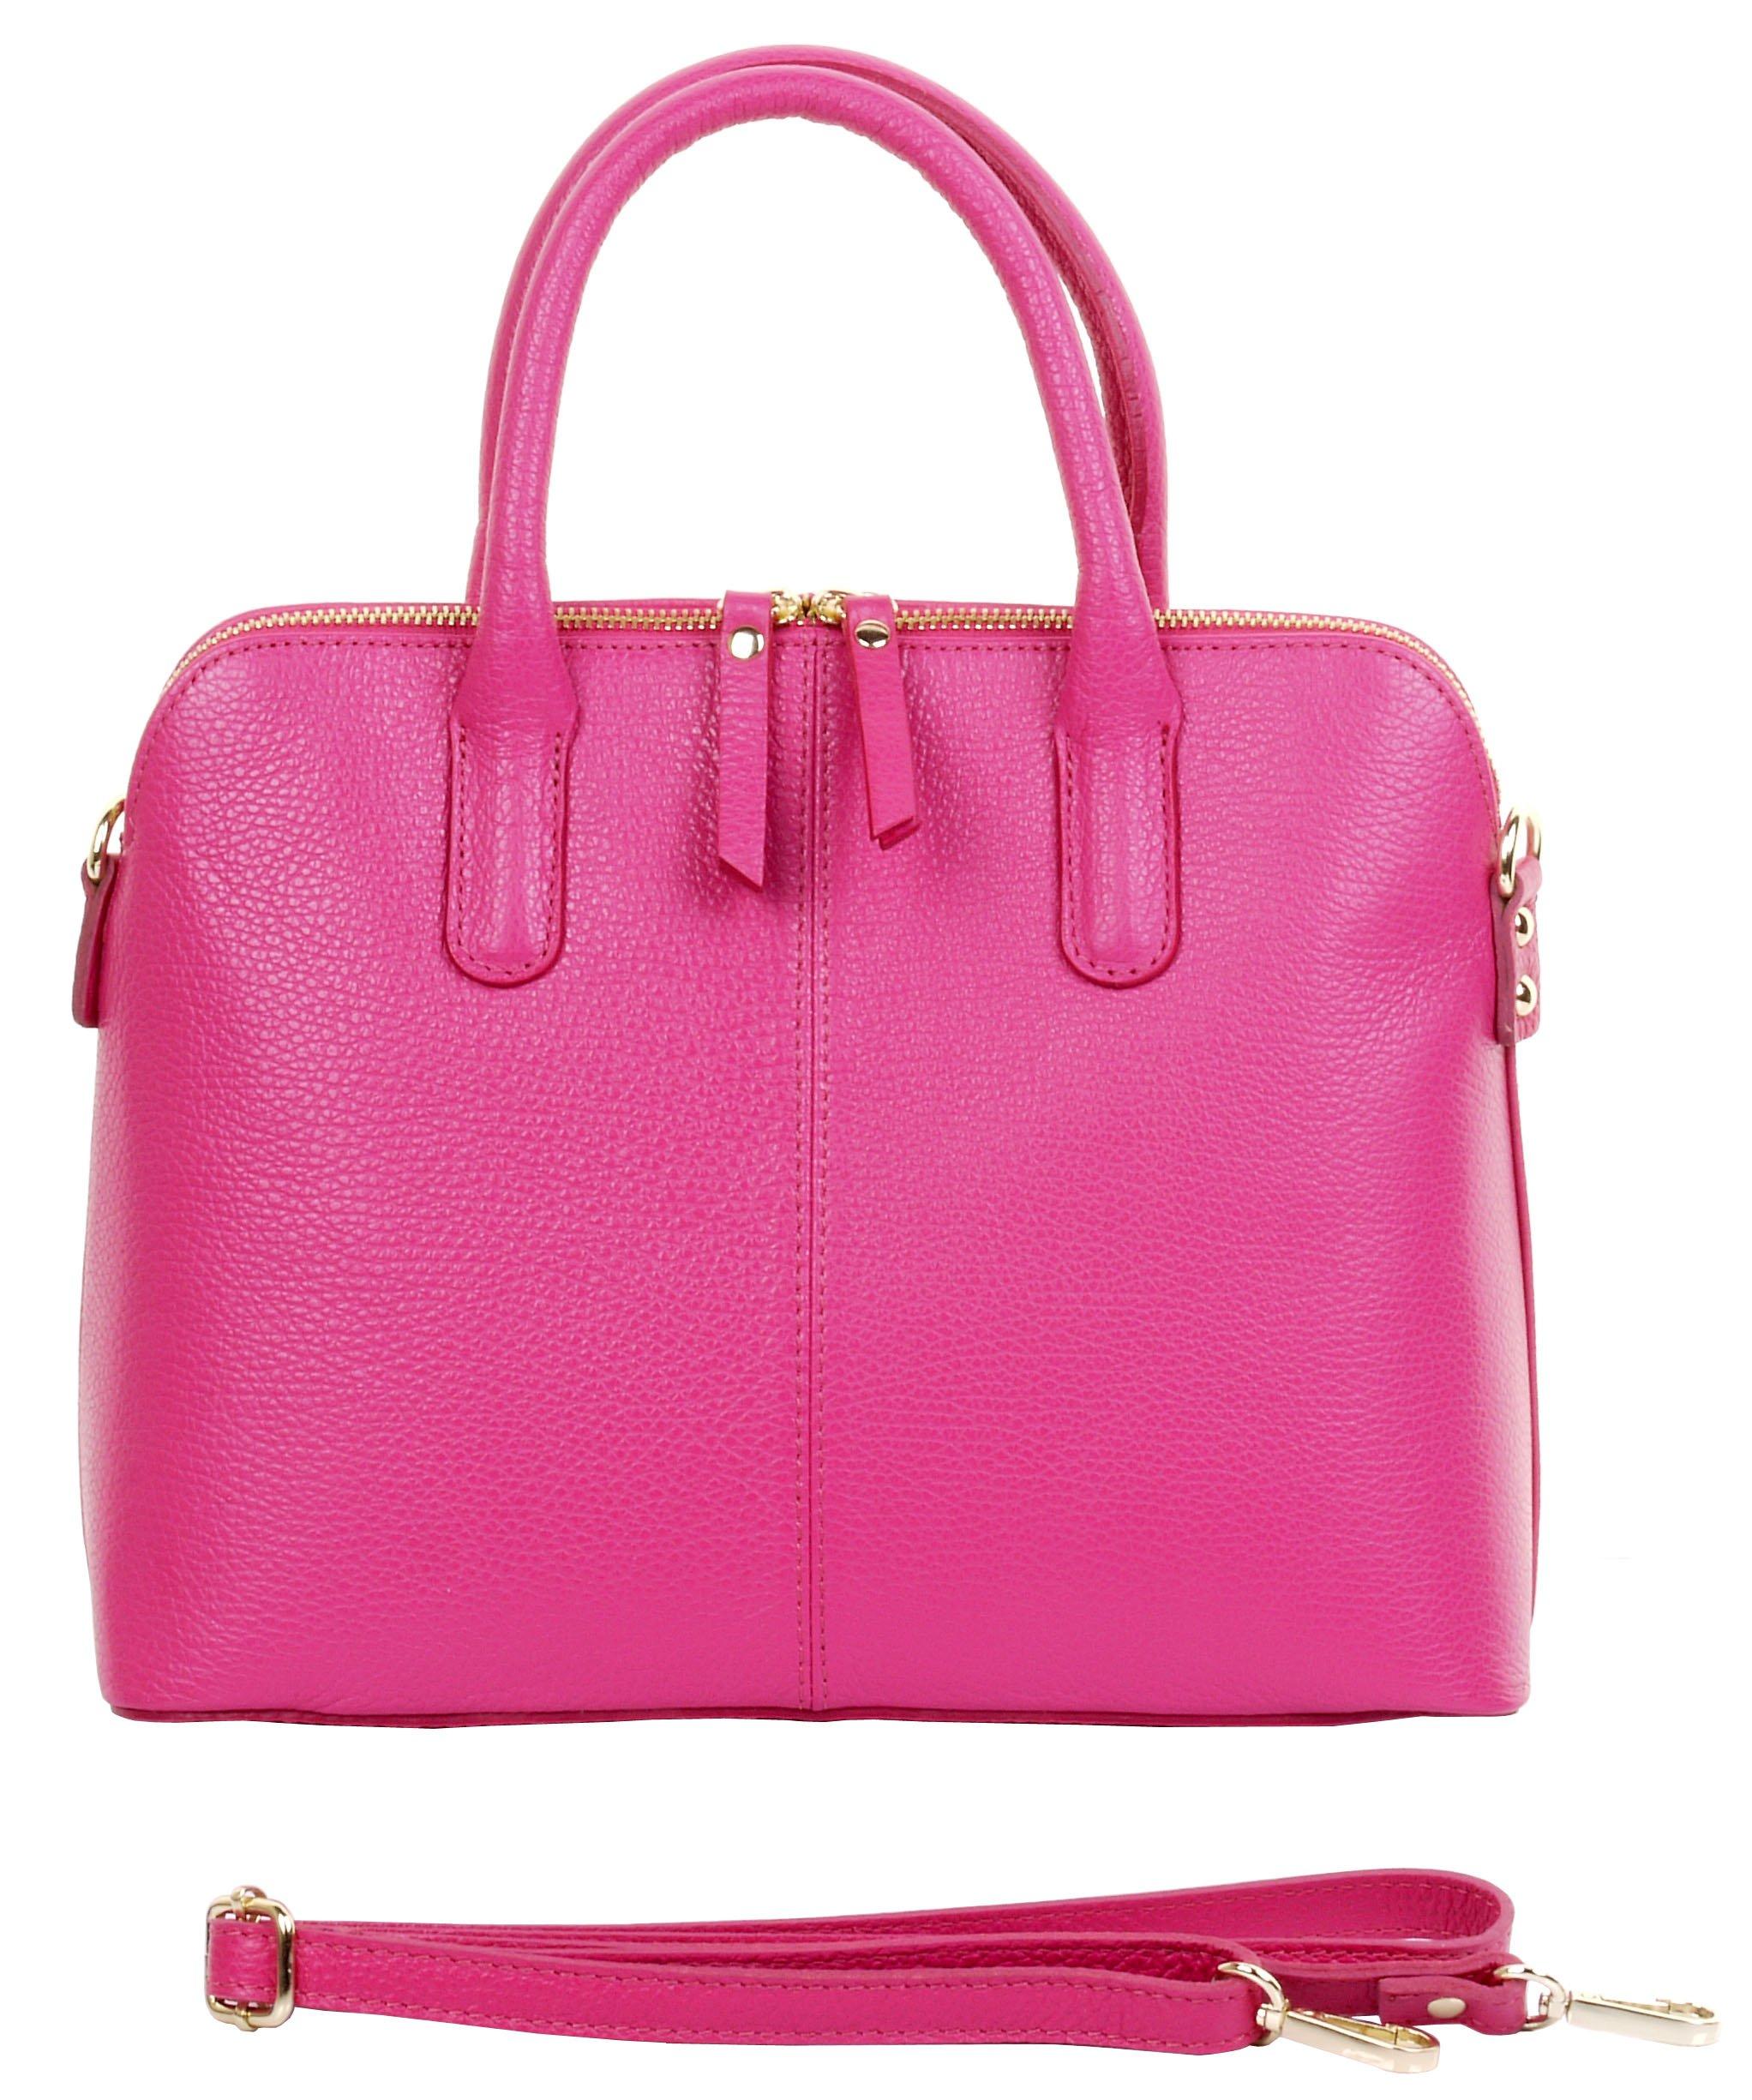 Primo Sacchi Italian Textured Leather Pink Bowling Style Tote Grab Bag or Shoulder Bag Handbag